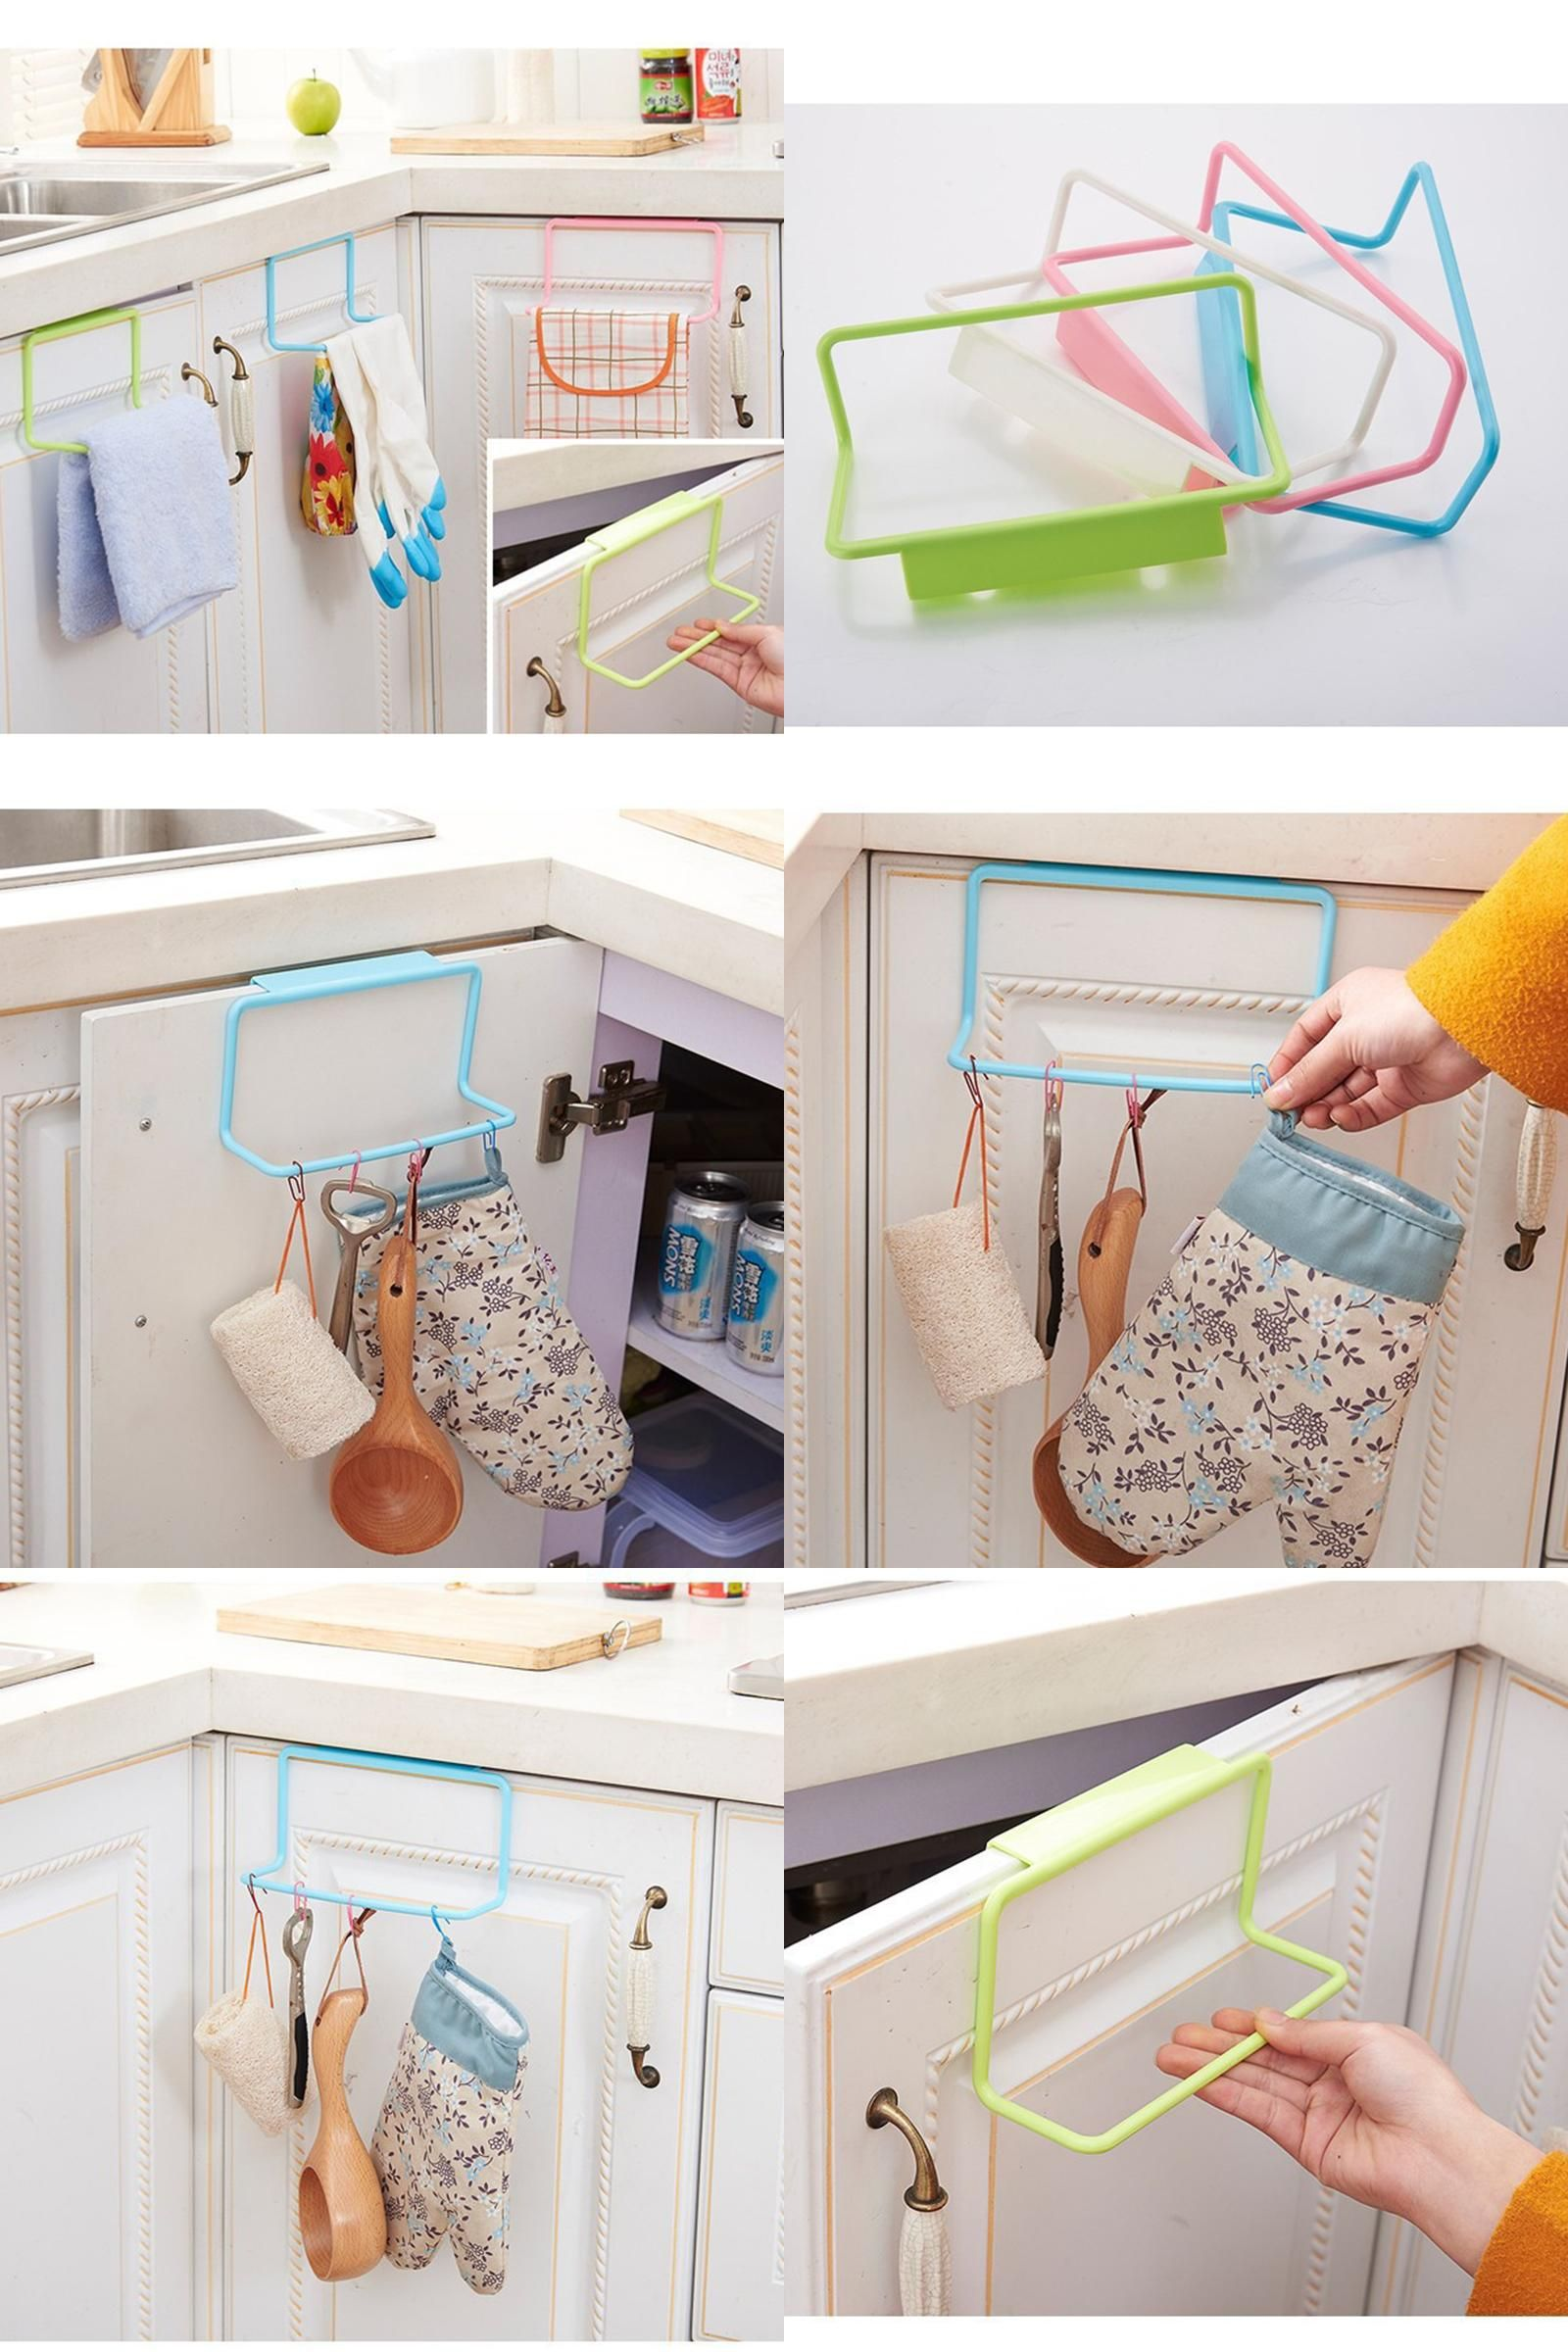 Visit To Buy Plastic Towel Rack Kitchen Cupboard Hanging Wash Cloth